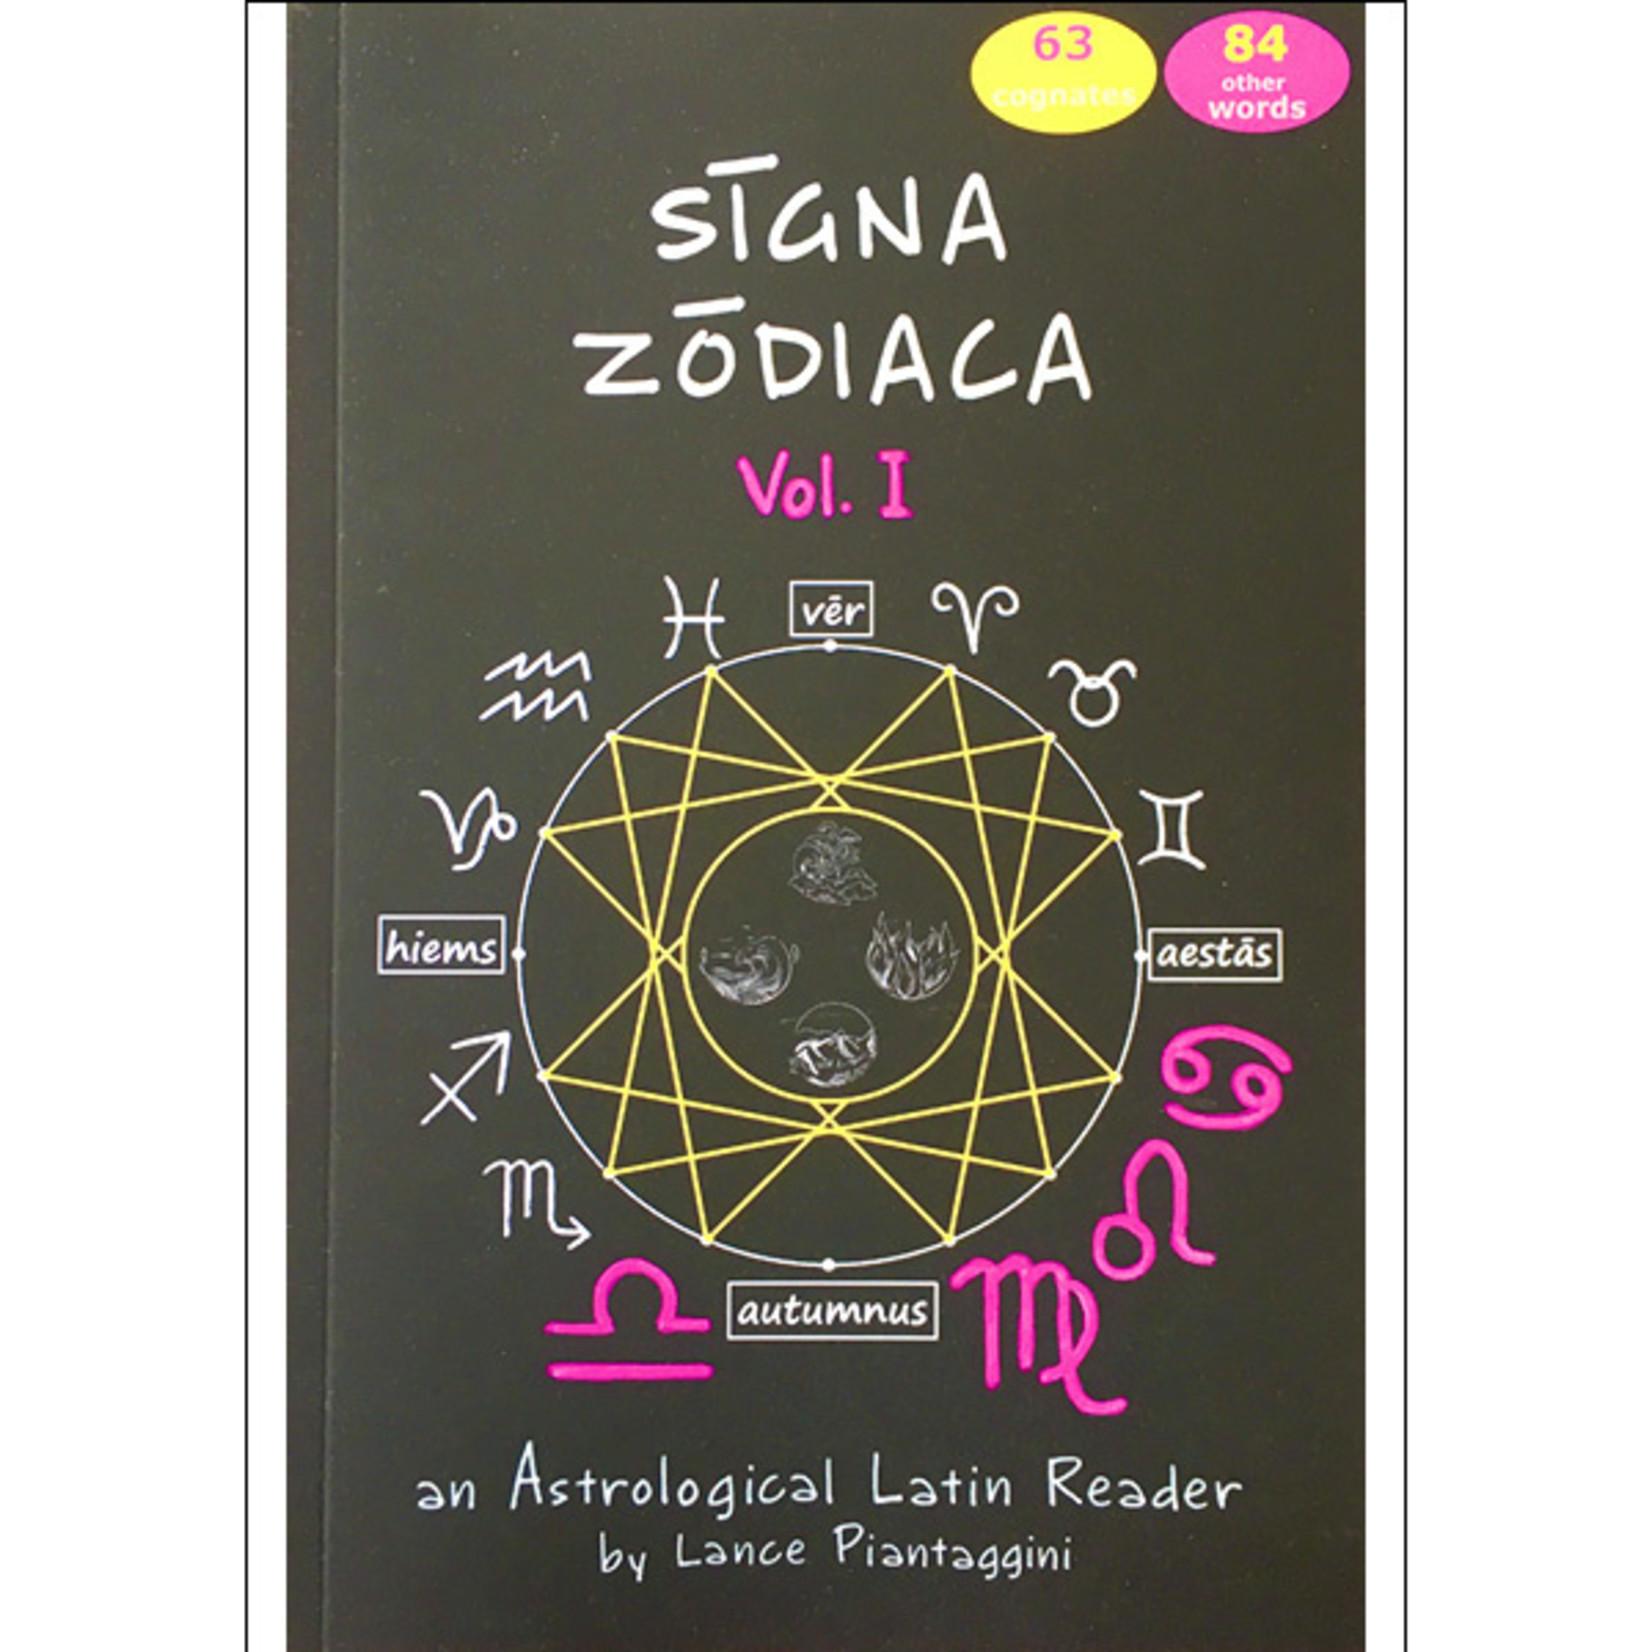 Magister P Sīgna zōdiaca I